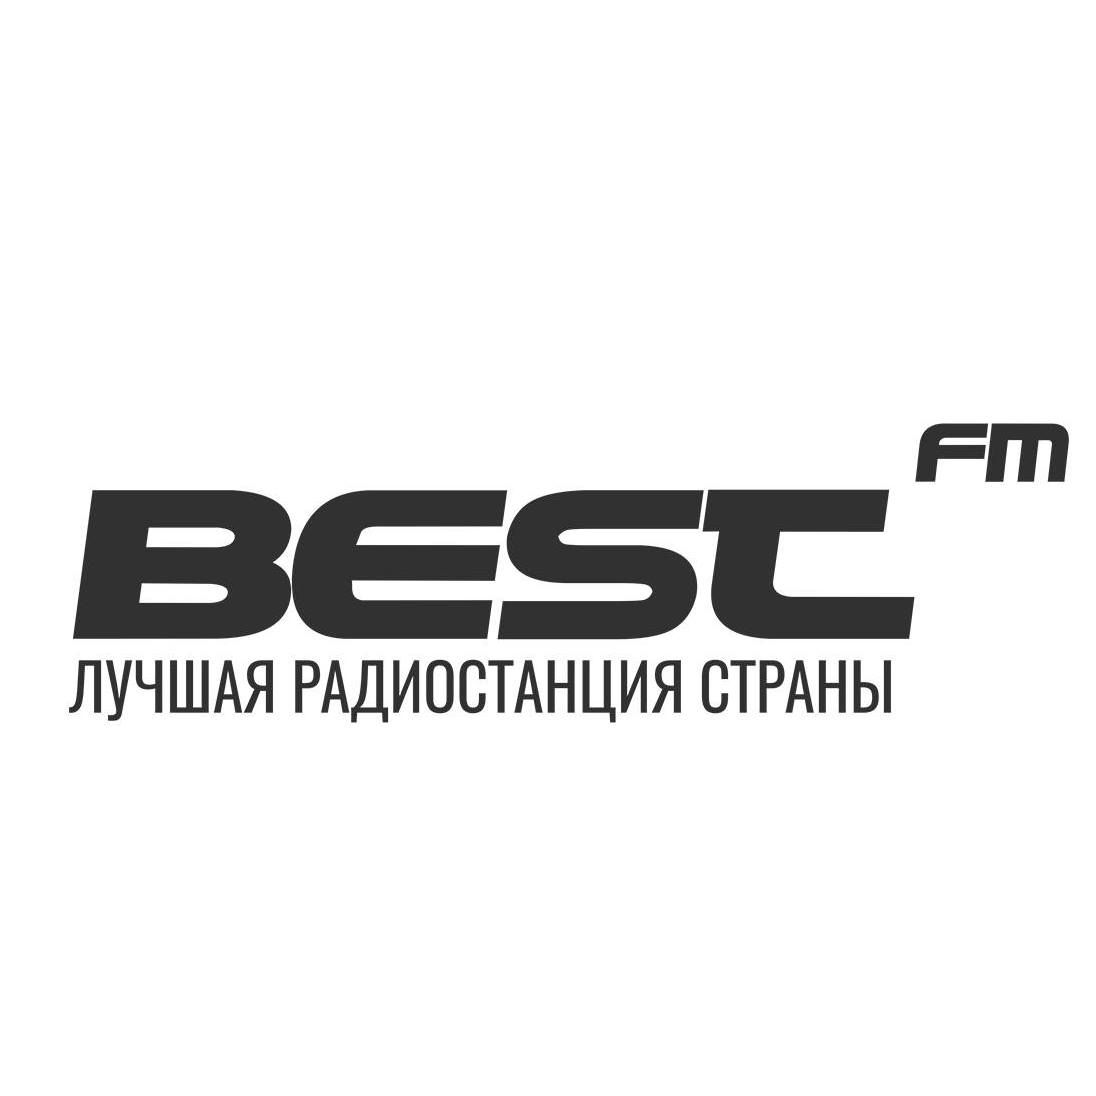 Radio Best FM 102.8 FM Ukraine, Mariupol